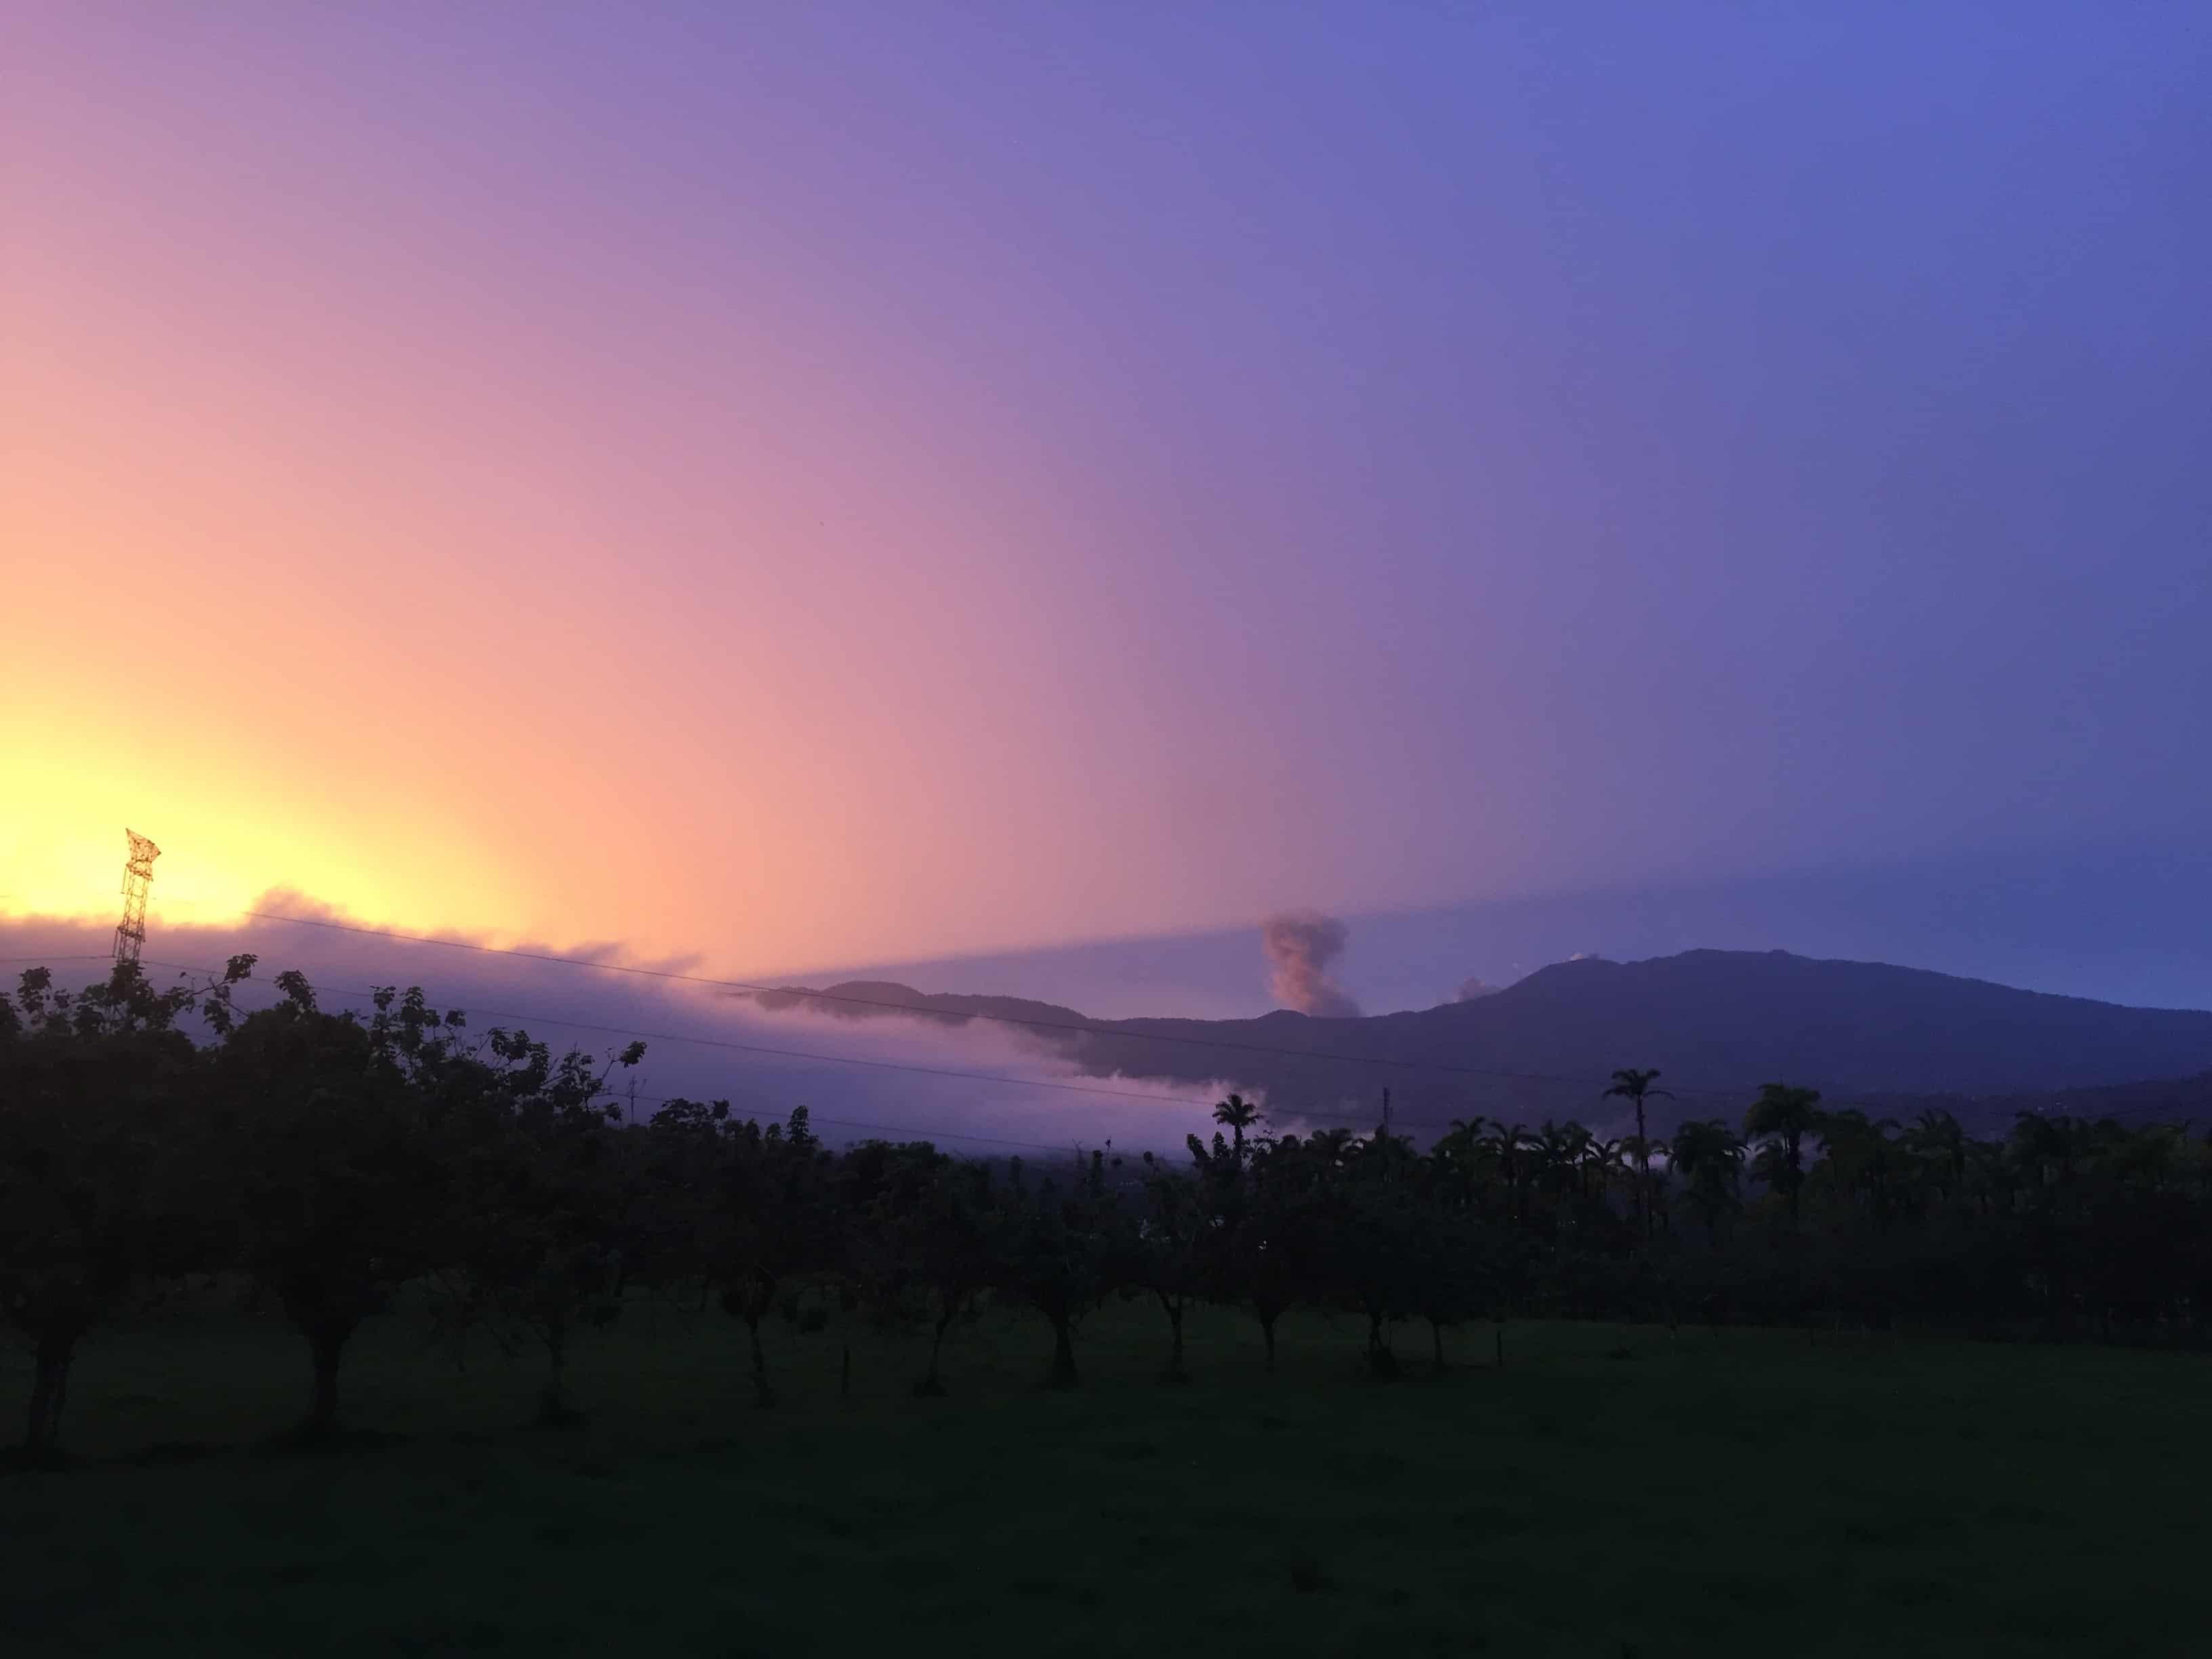 Sunset overlooking Turrialba Volcano.